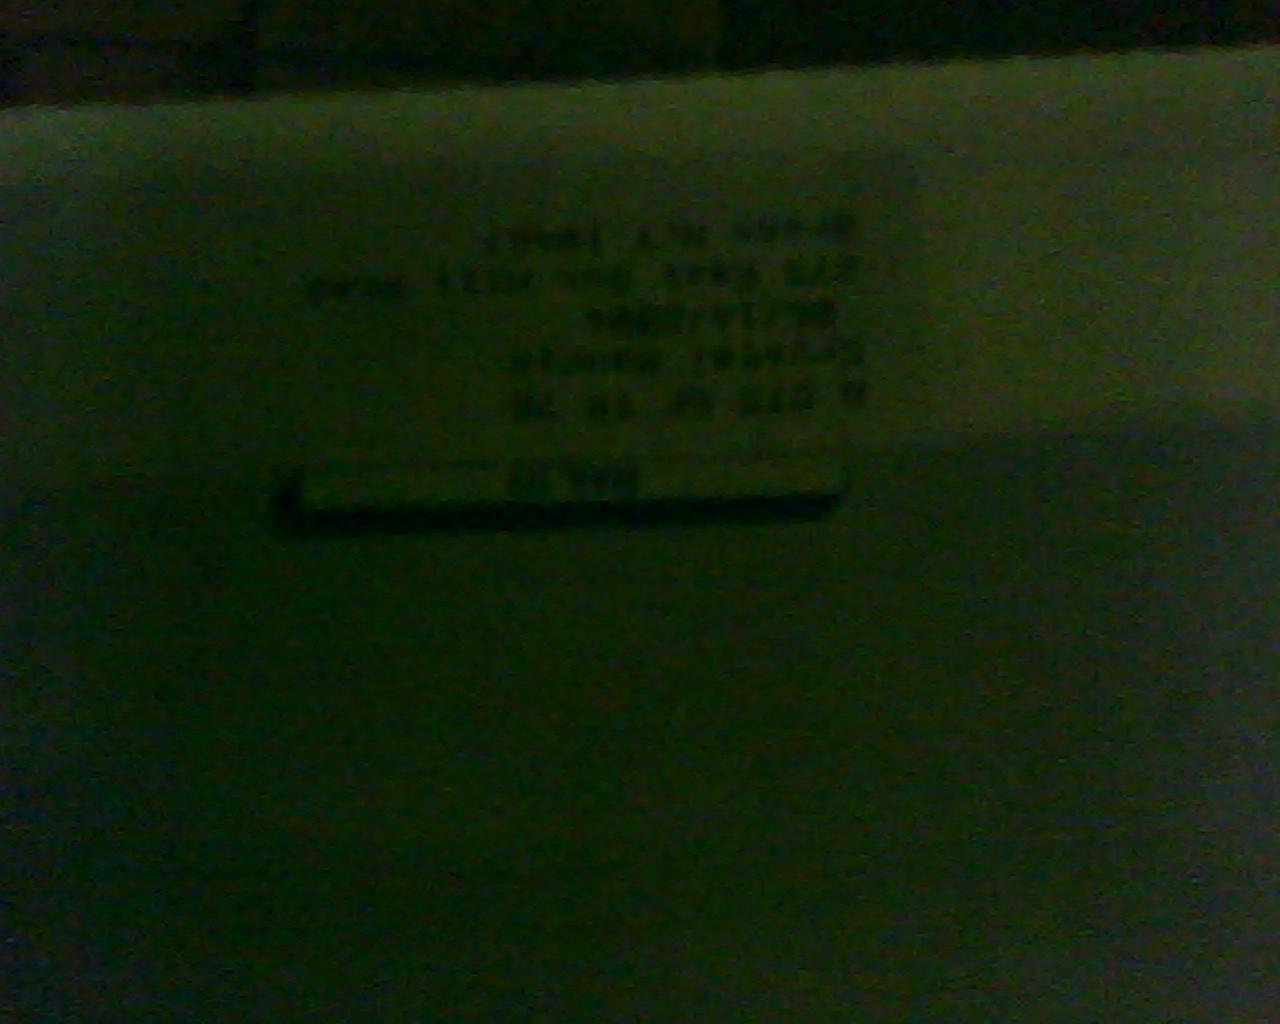 rent receipts